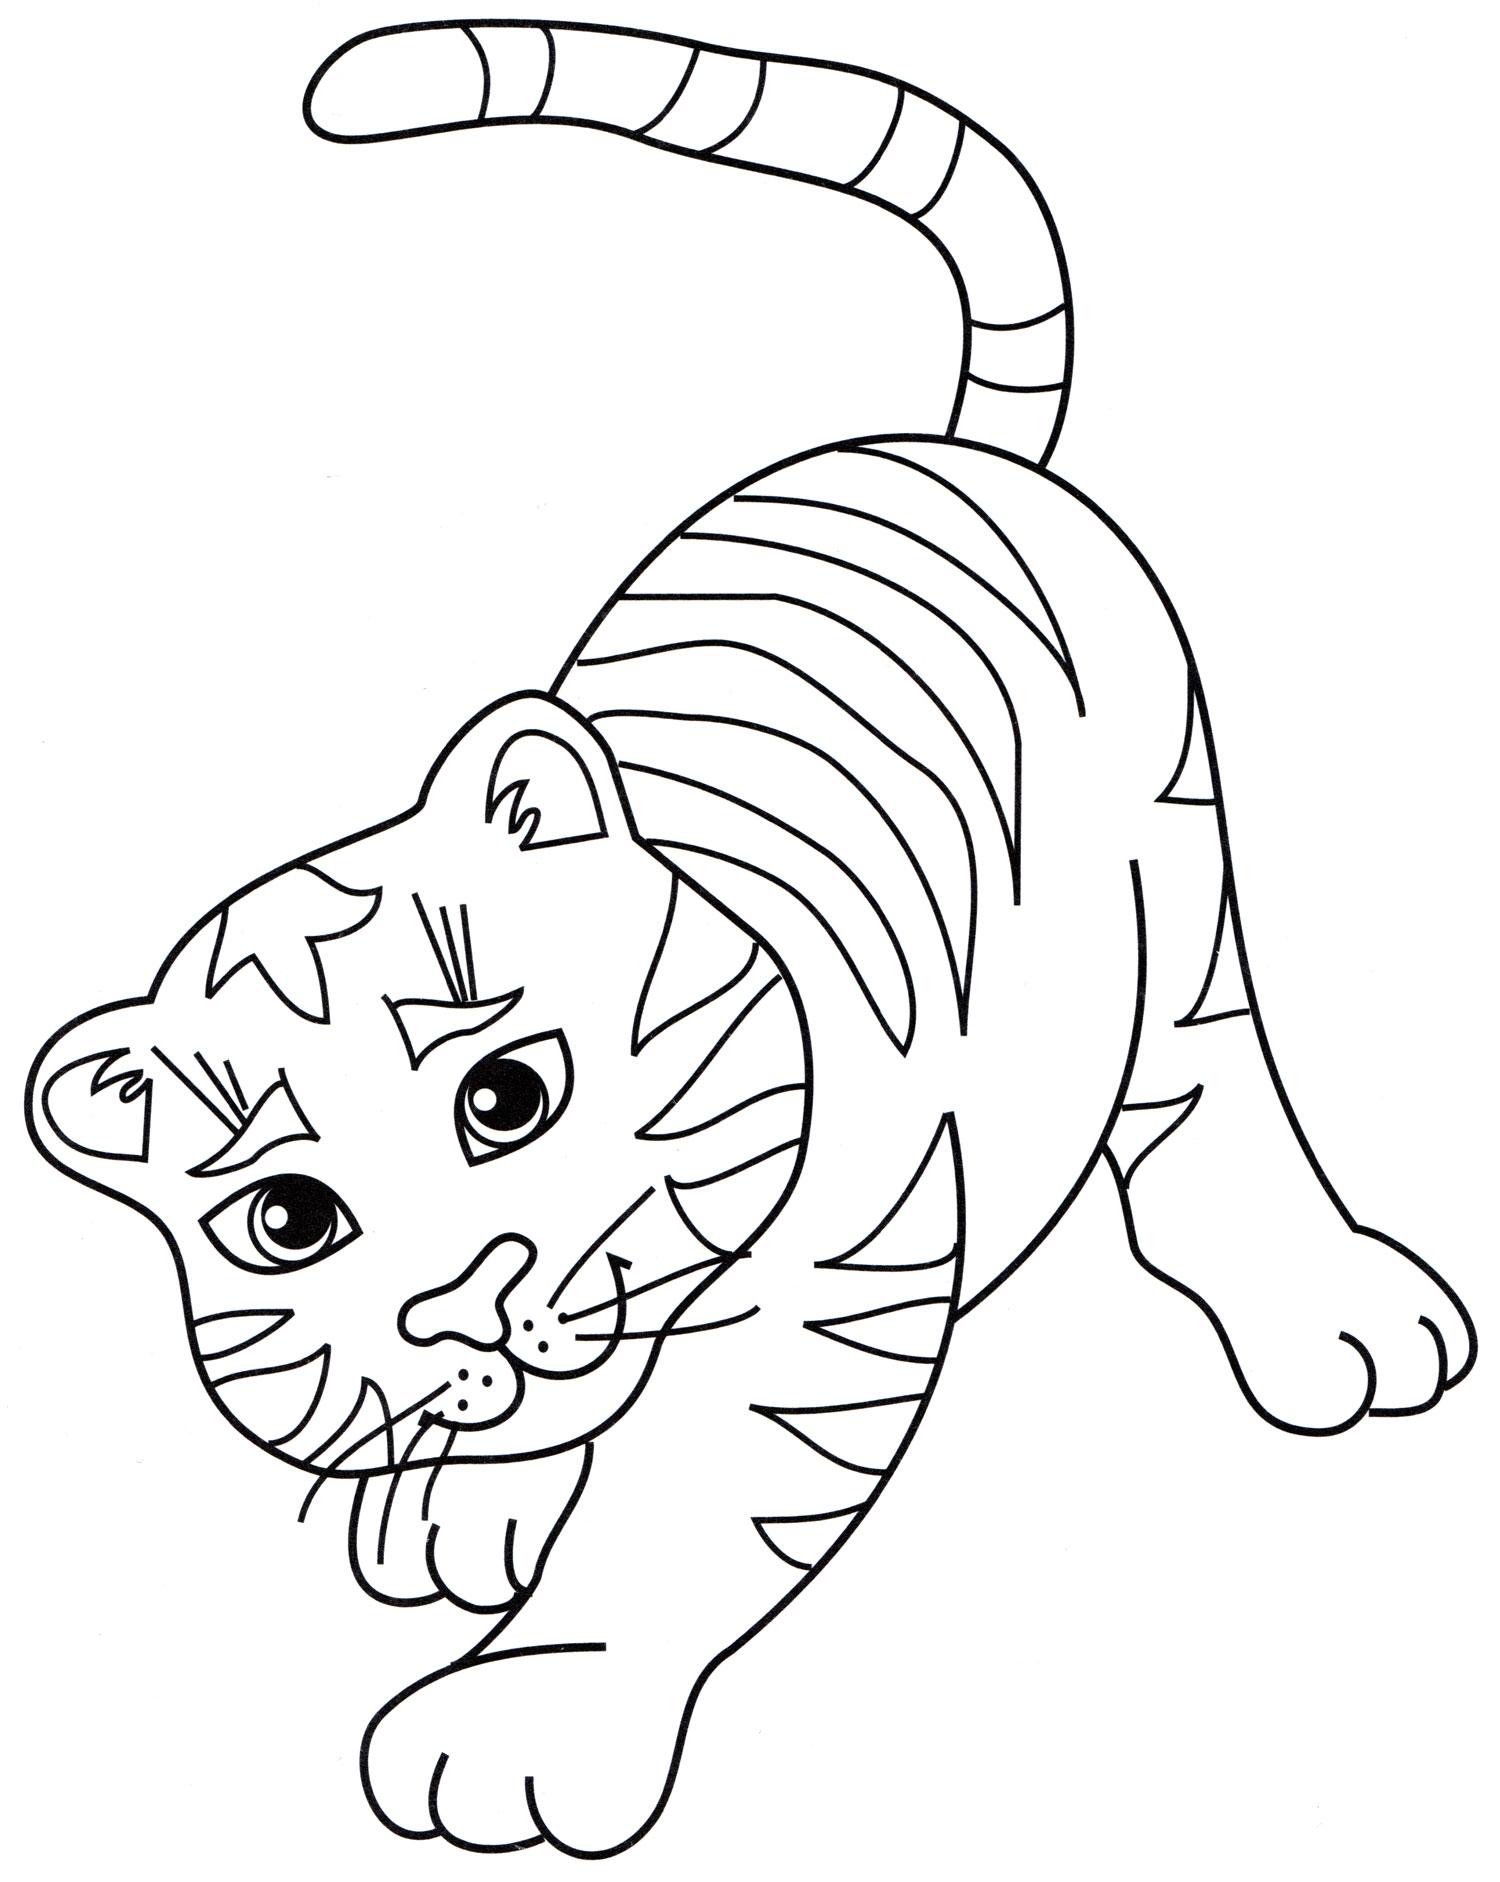 Рисунок смешного тигренка разукрашки